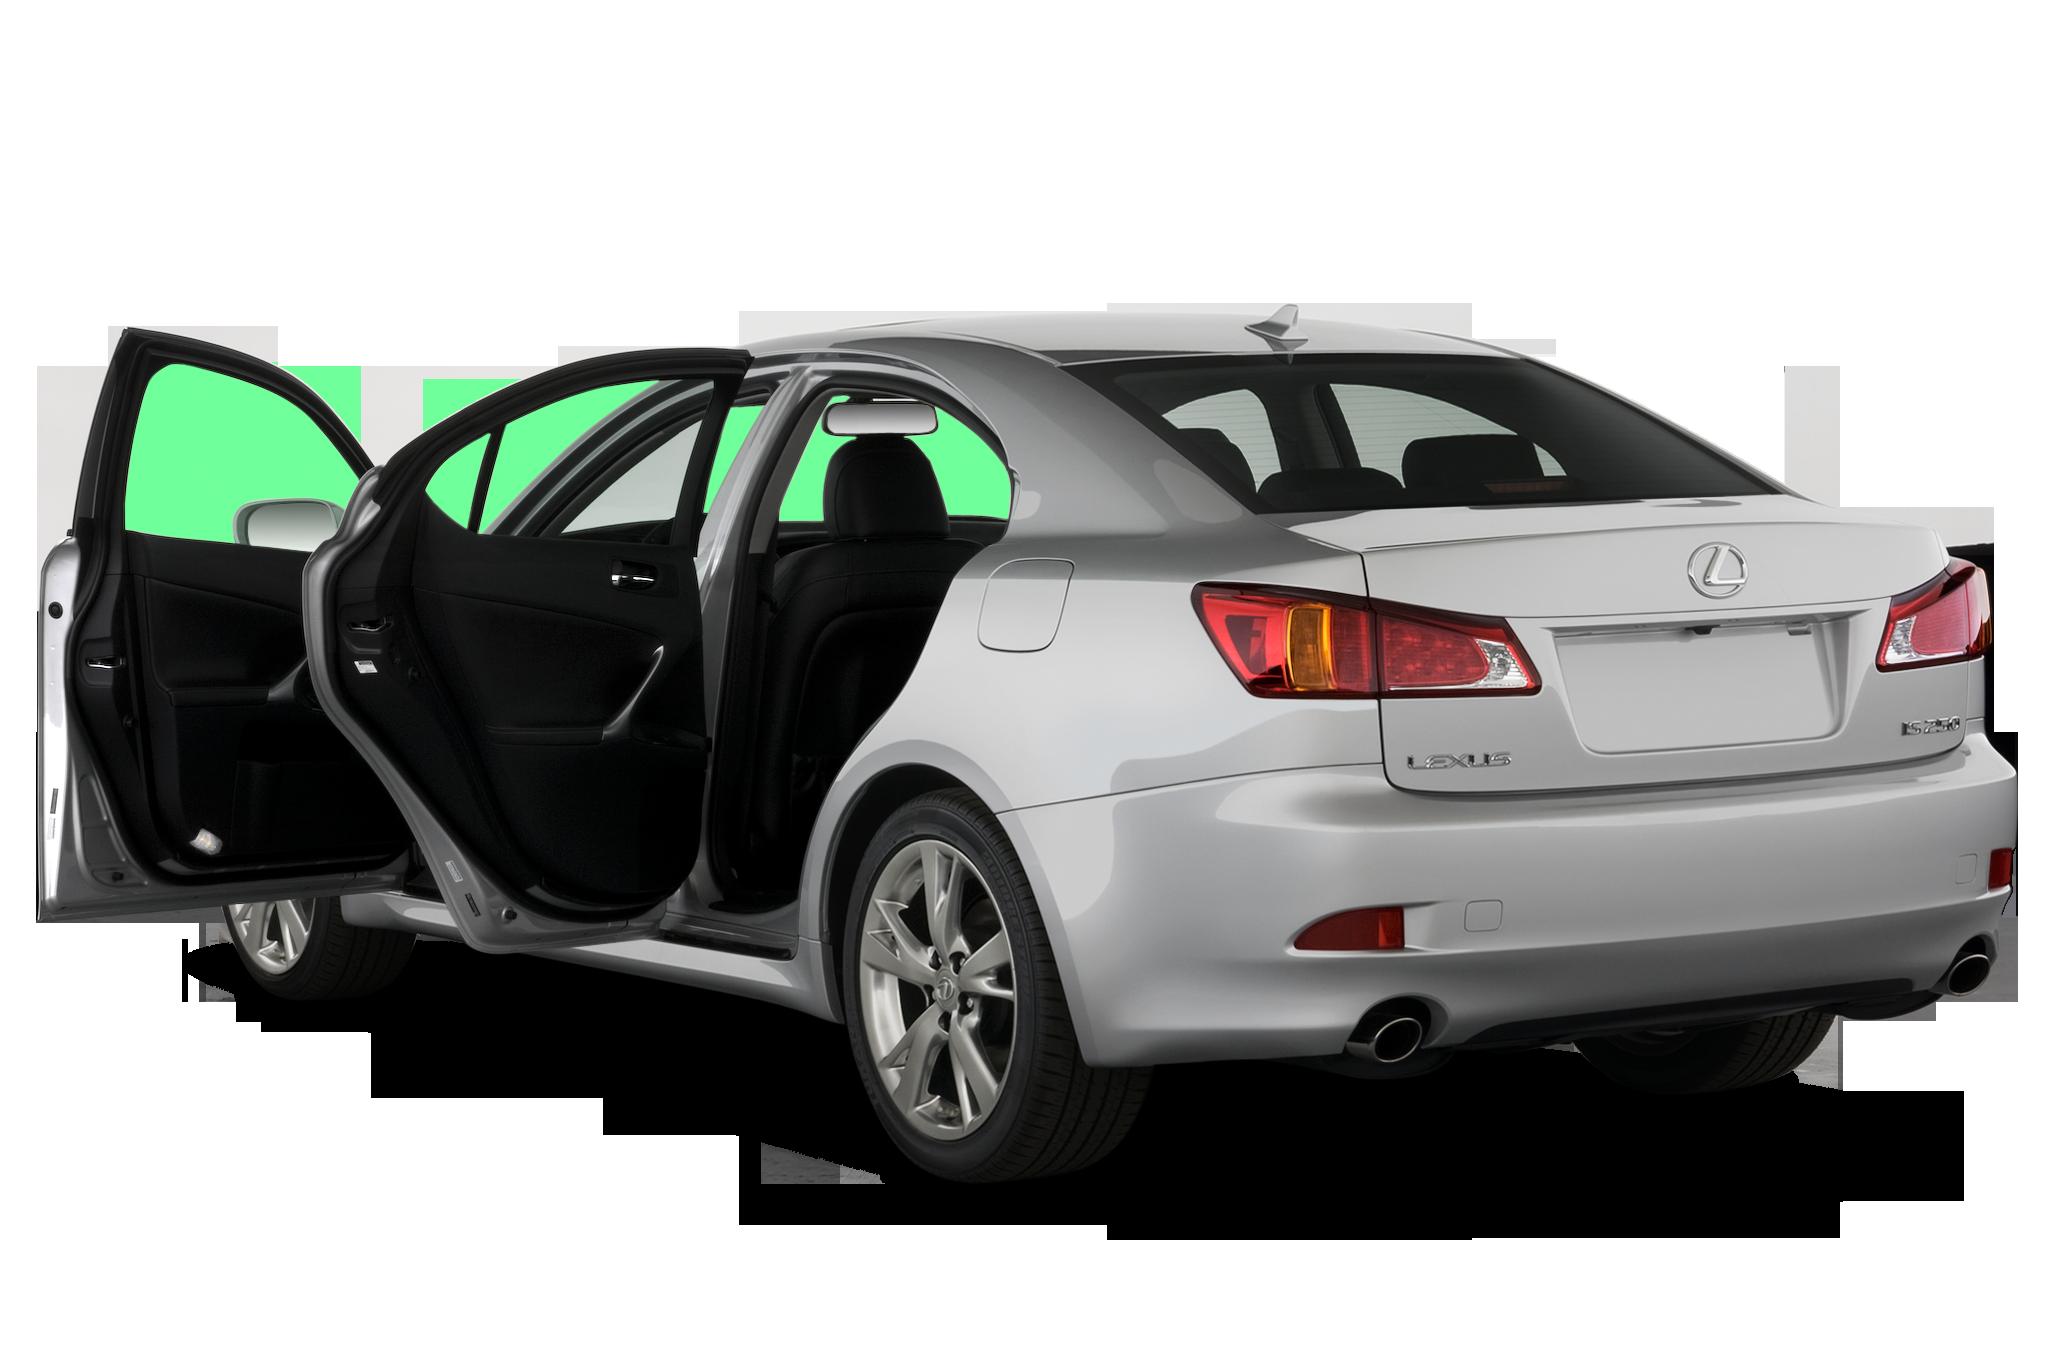 2010 lexus is 250c and is 350c convertibles 2008 paris motor show coverage new car reviews. Black Bedroom Furniture Sets. Home Design Ideas